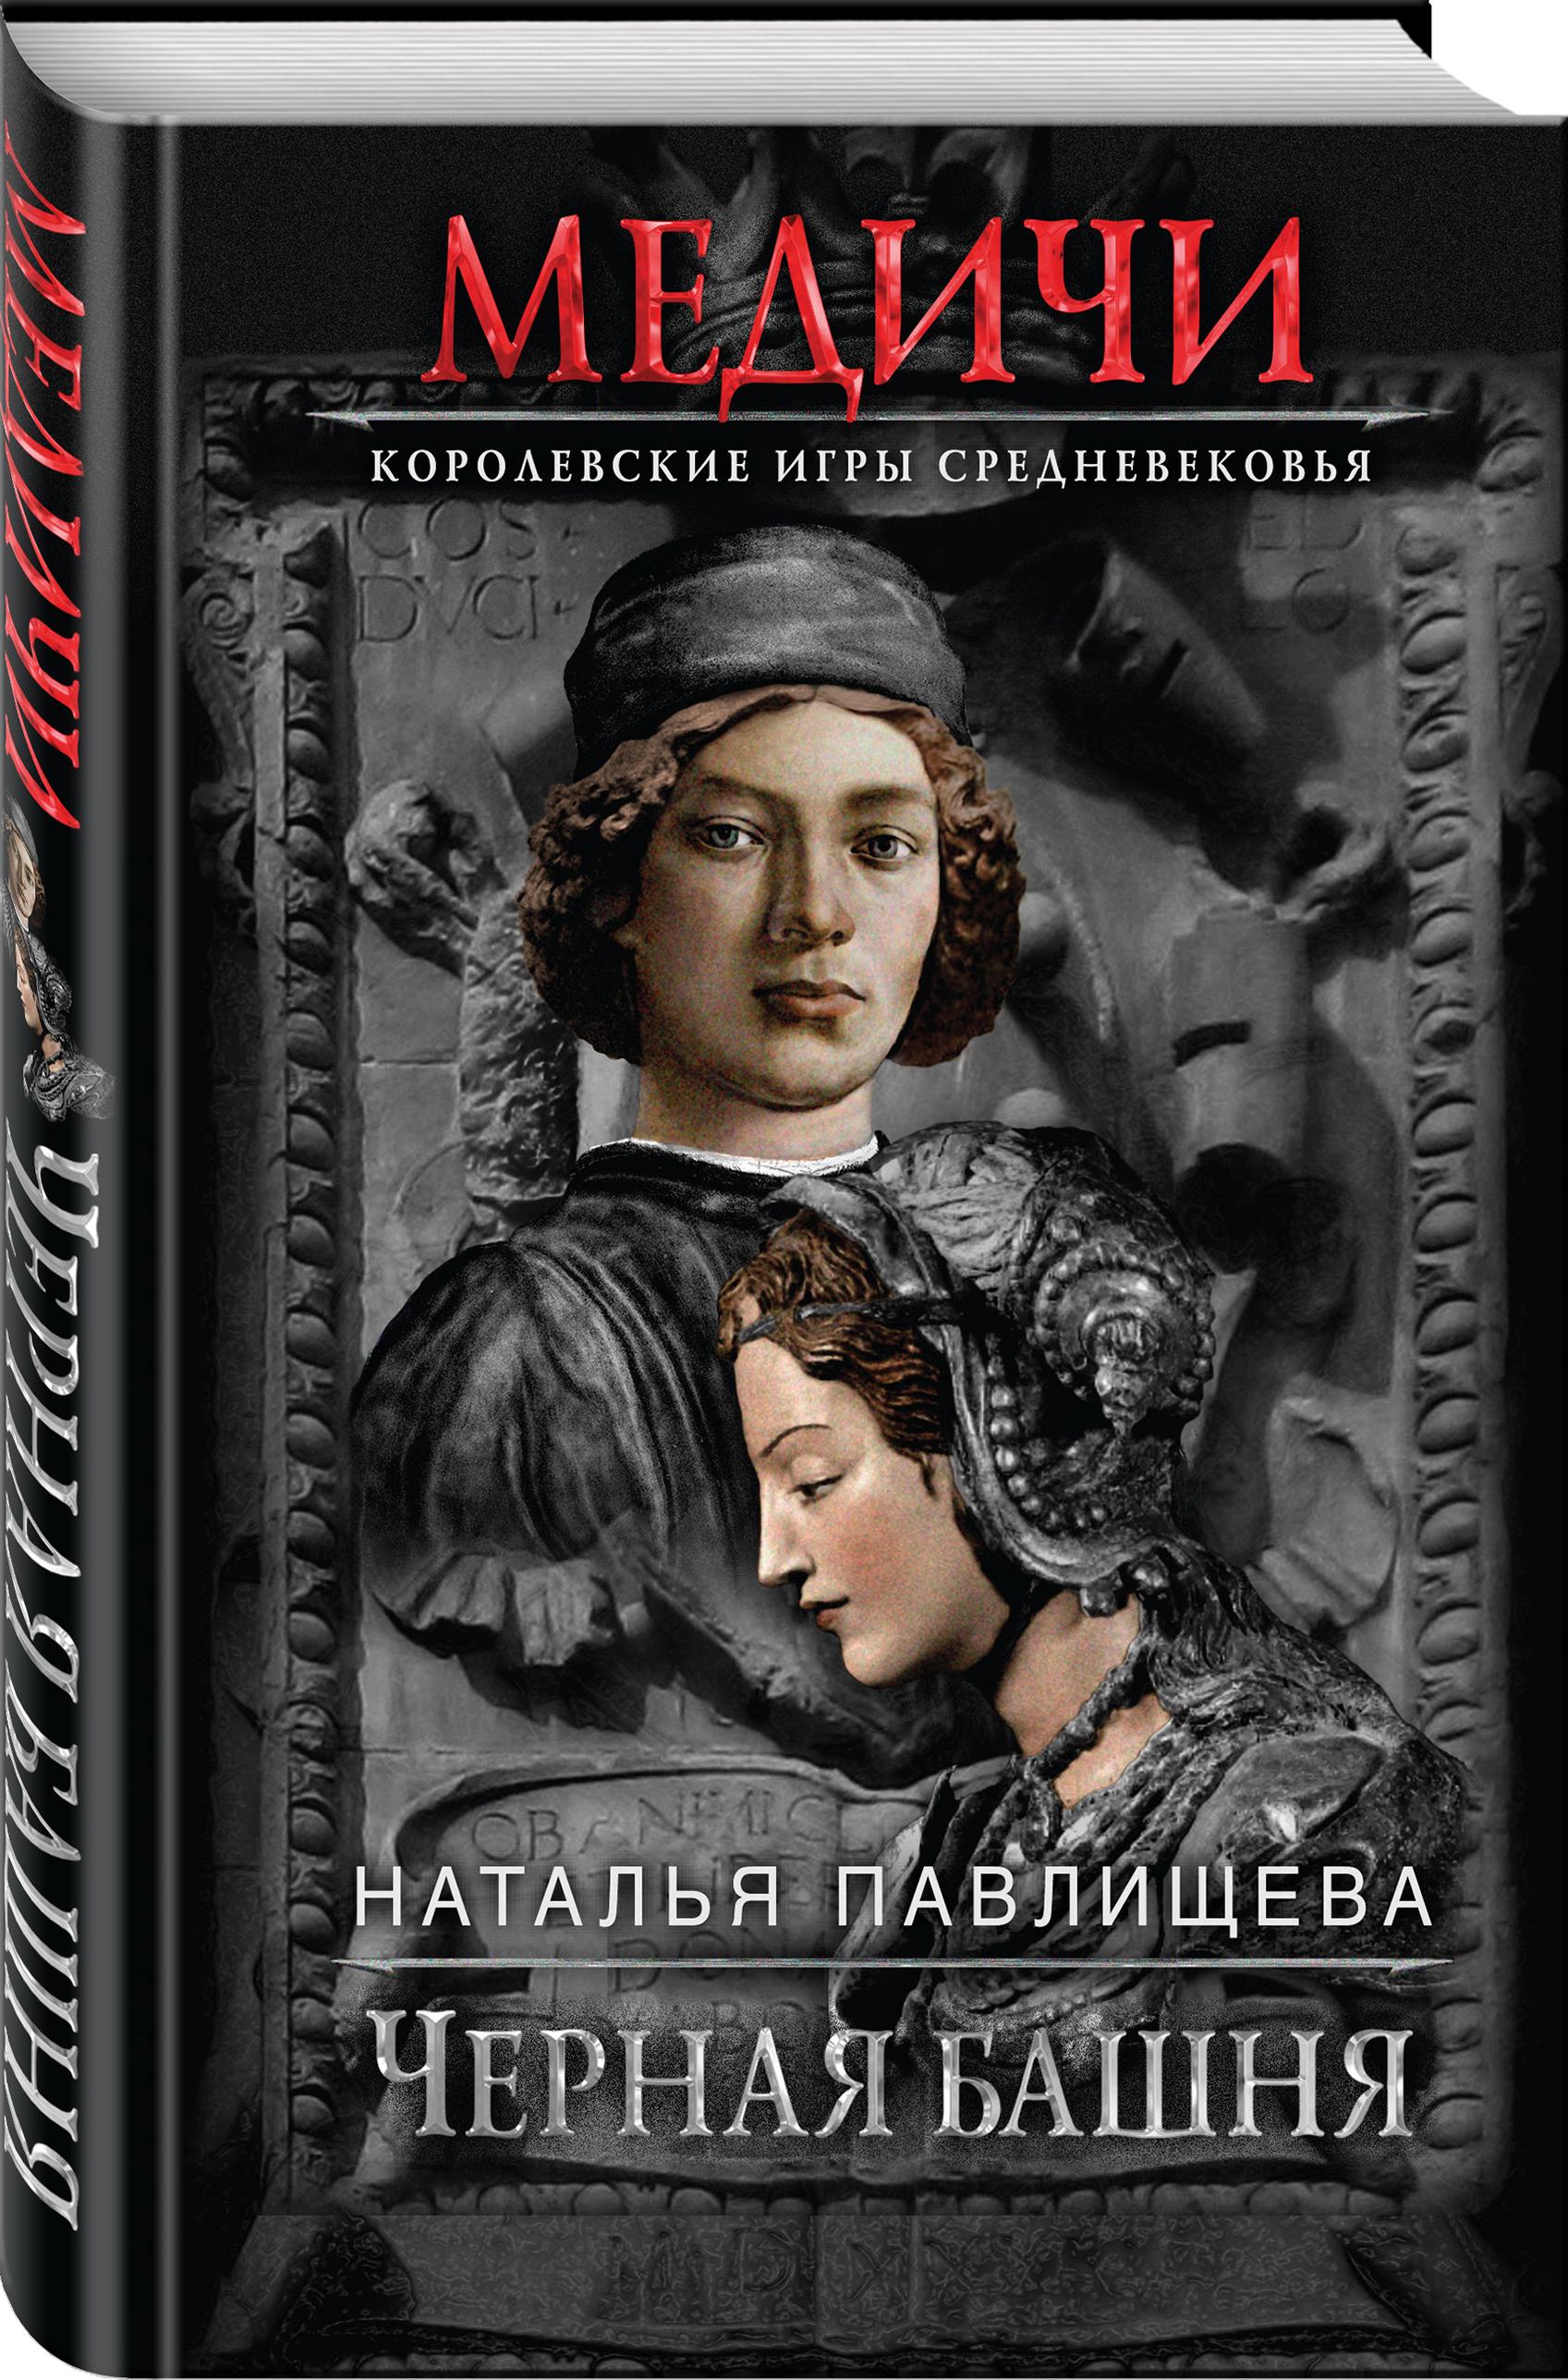 Наталья Павлищева Черная башня